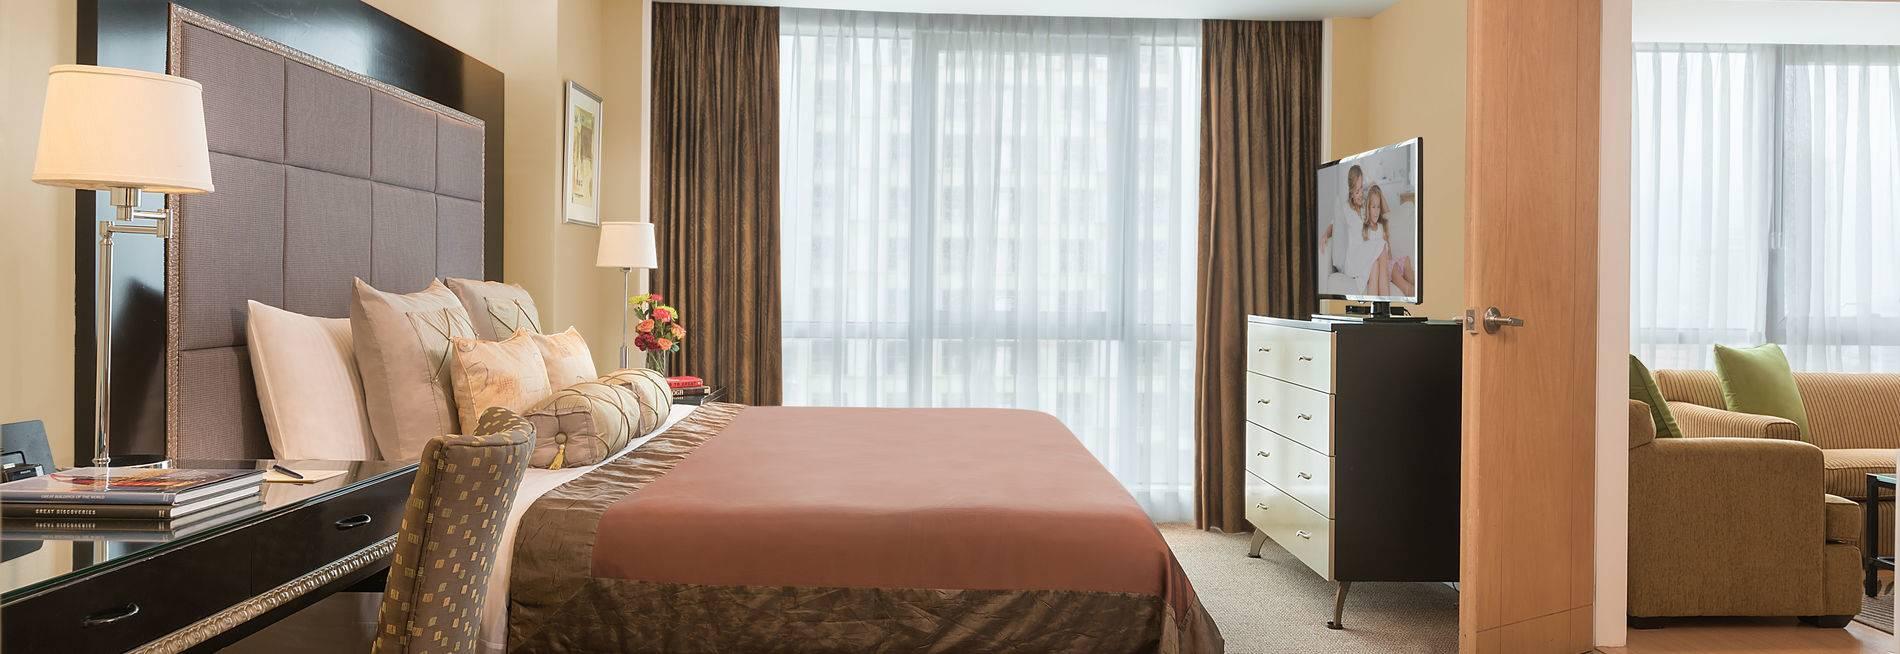 1 bedroom design ideas